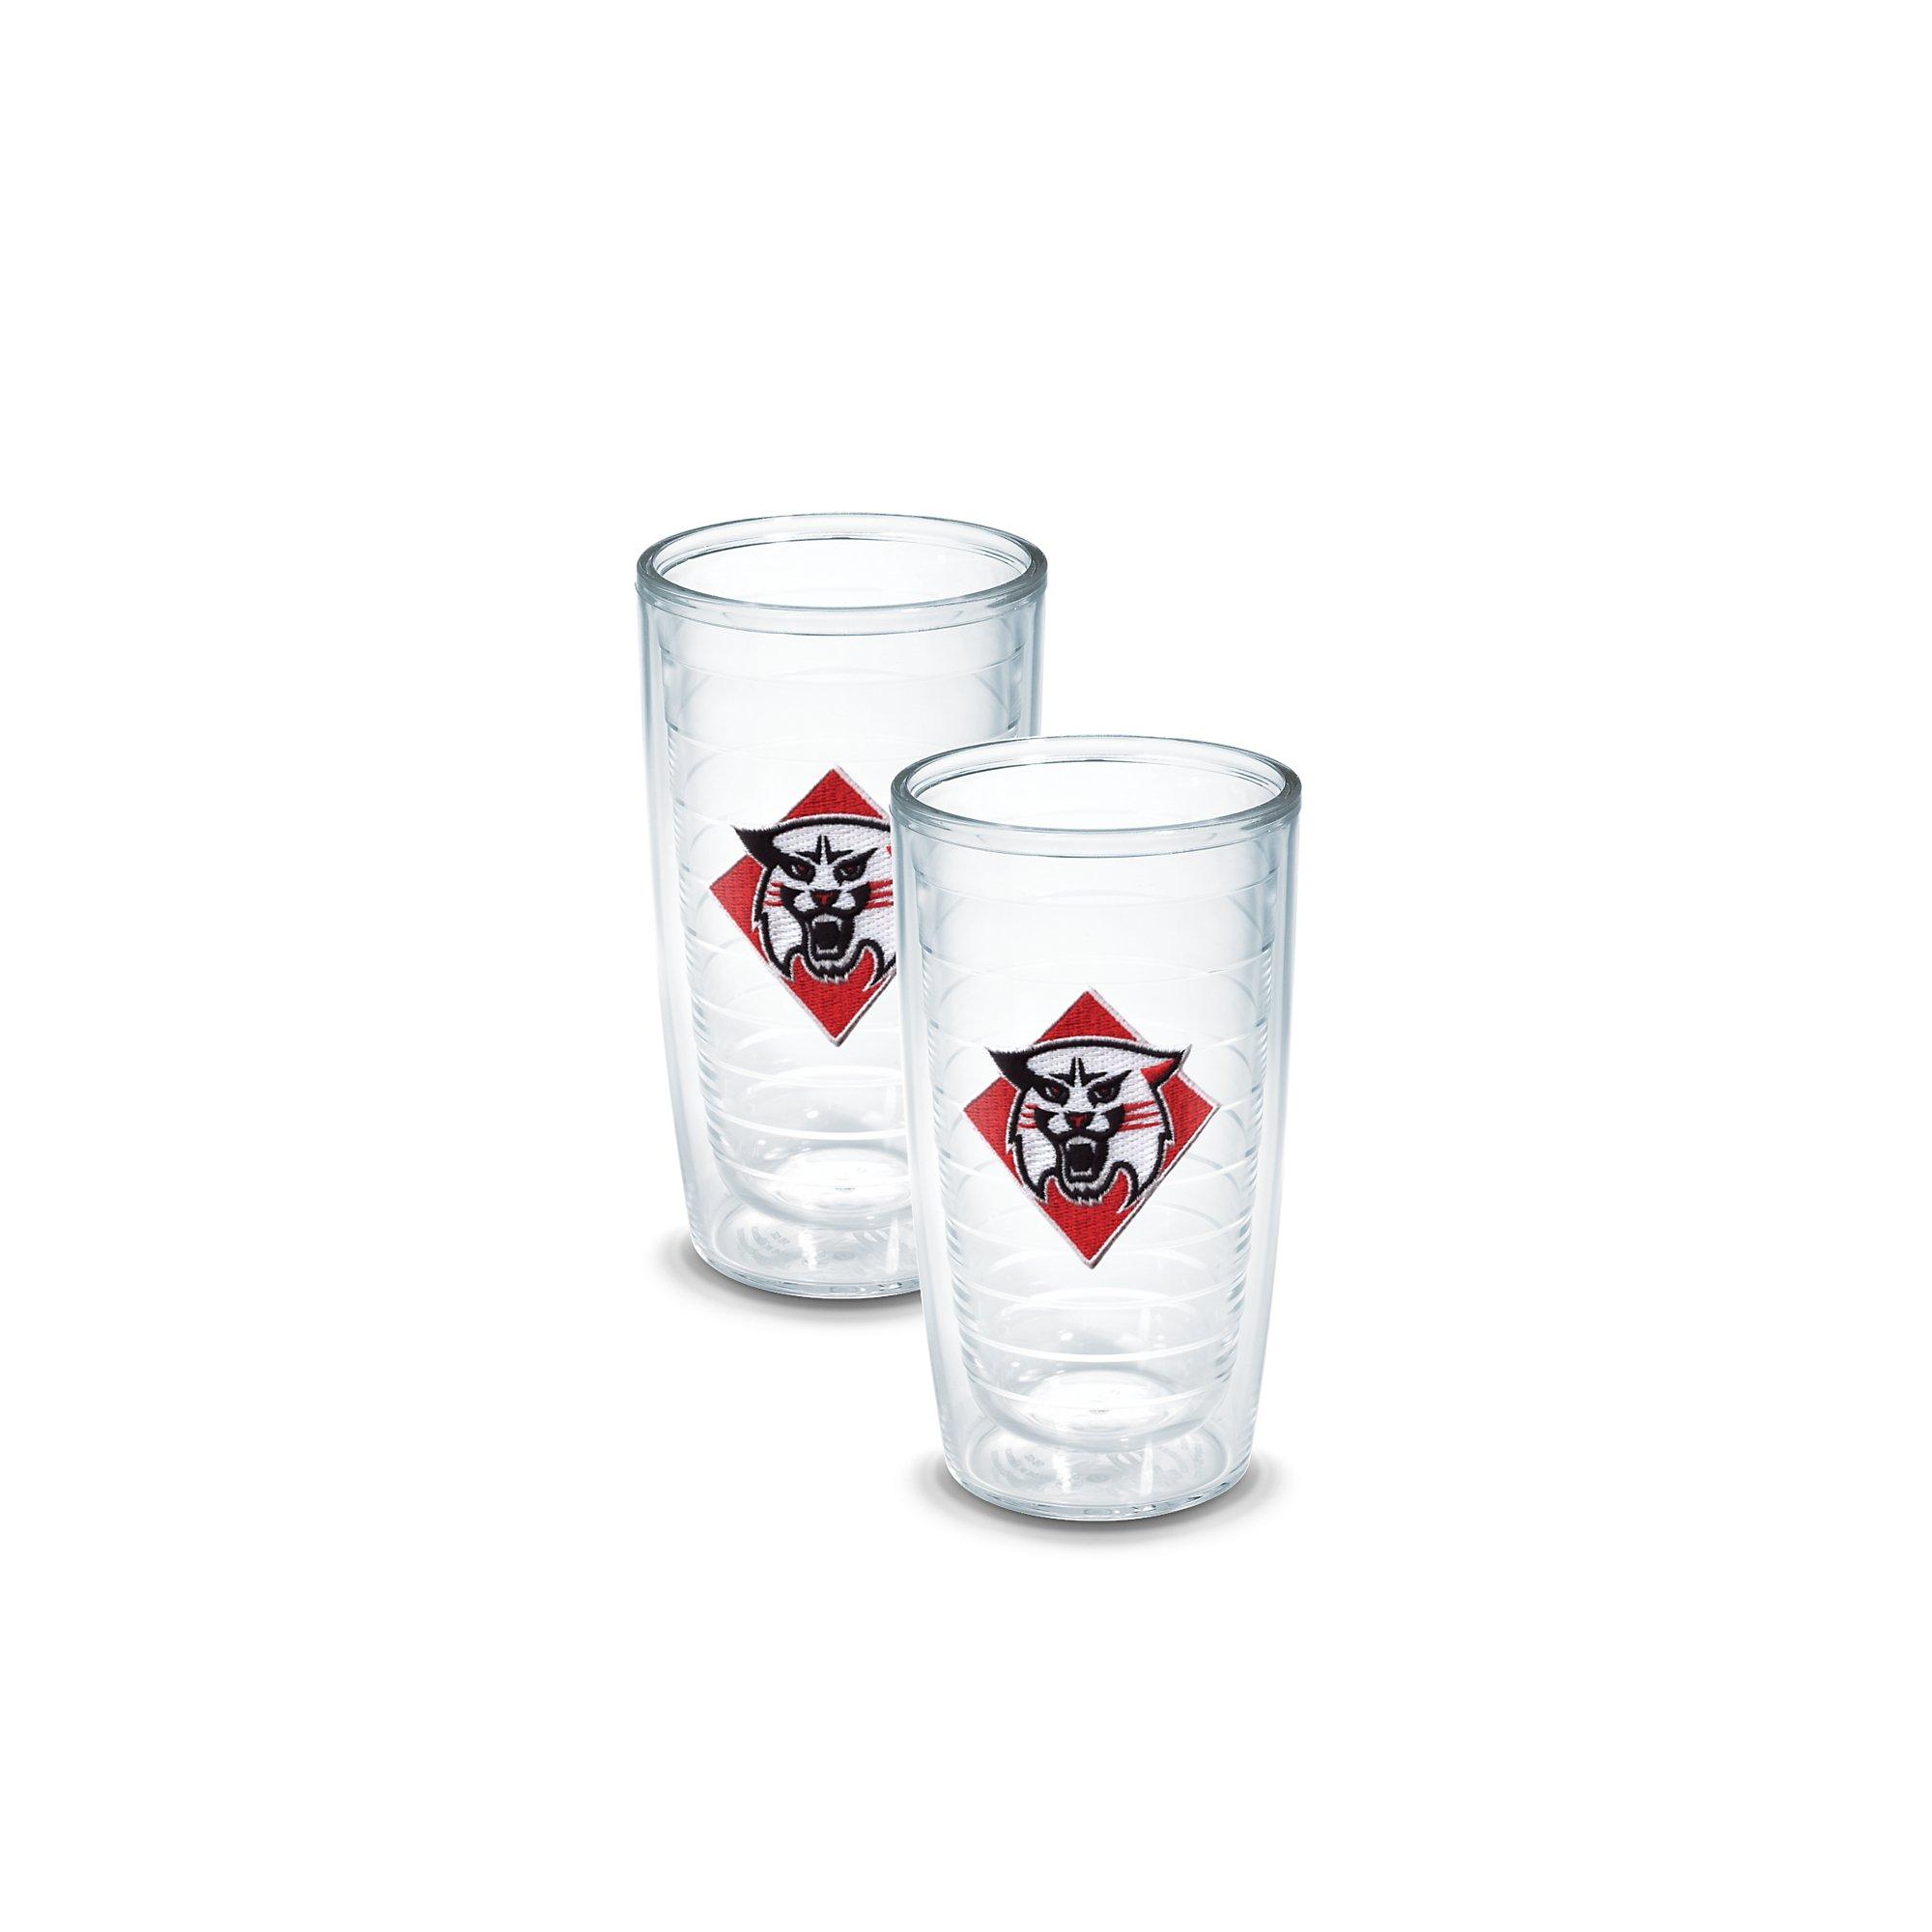 Tervis 1049911 Davidson College Emblem Tumbler, Set of 2, 16 oz, Clear